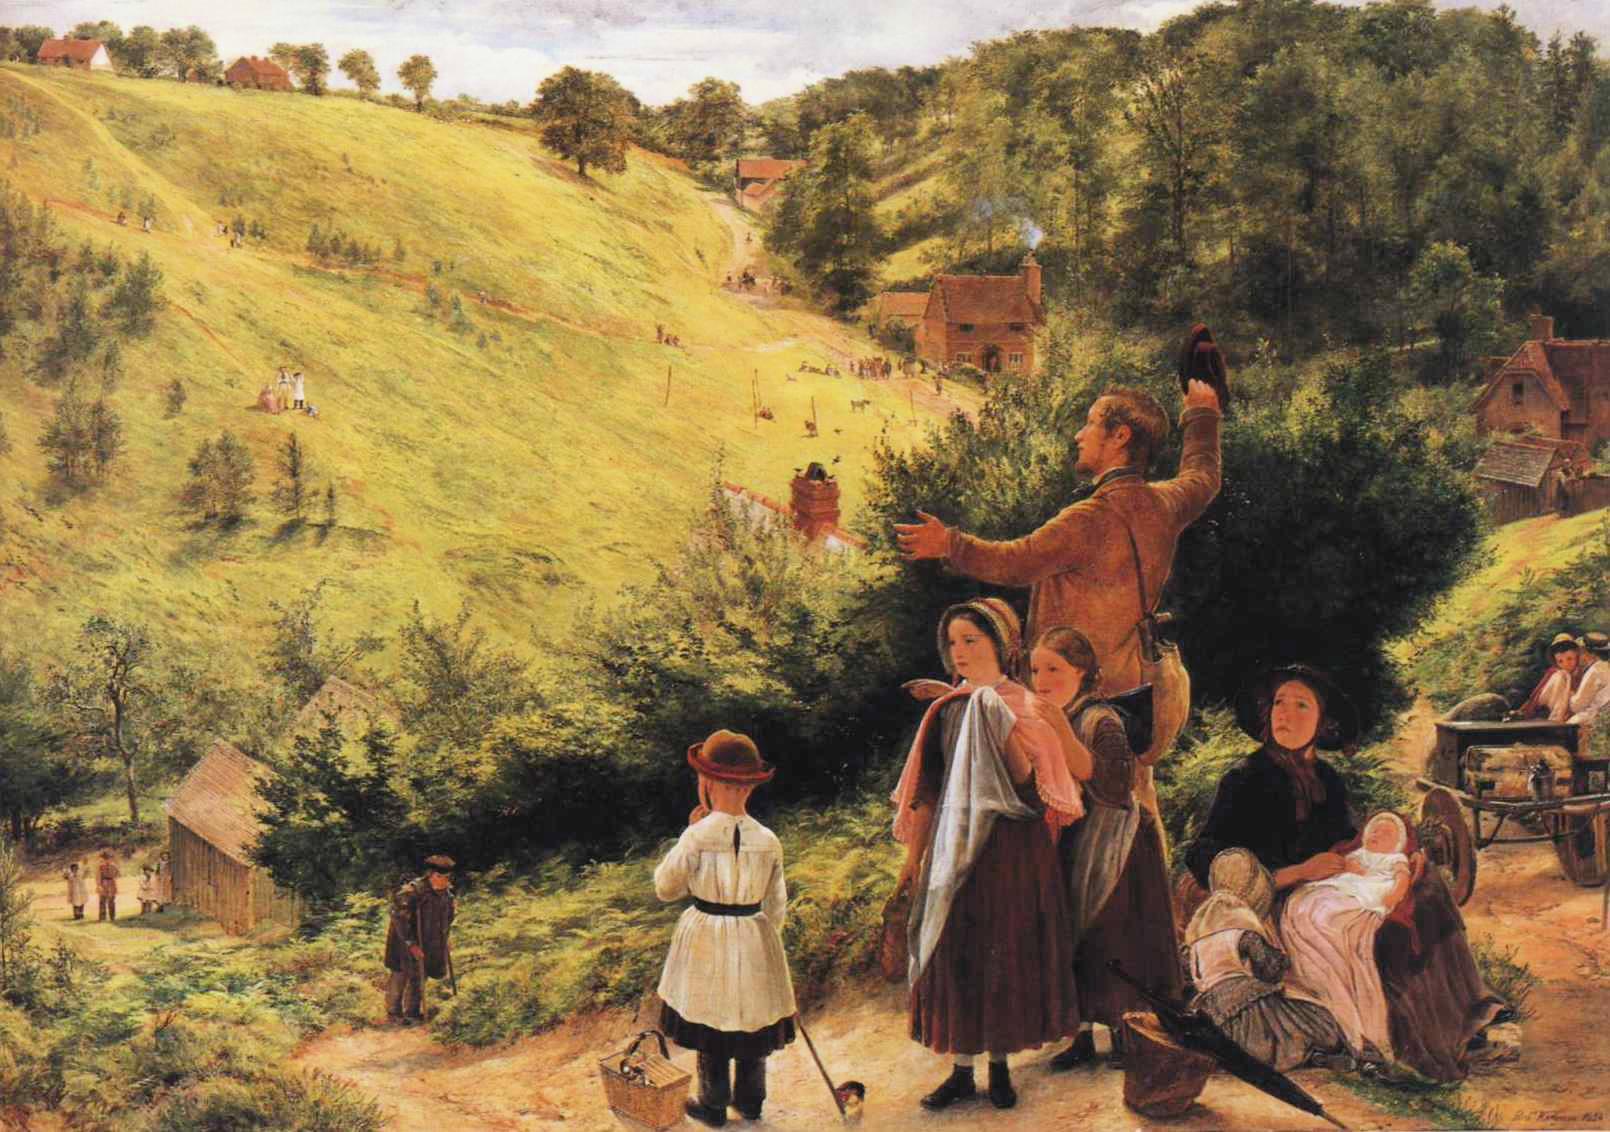 Richard_Redgrave_-_The_Emigrants'_Last_Sight_of_Home